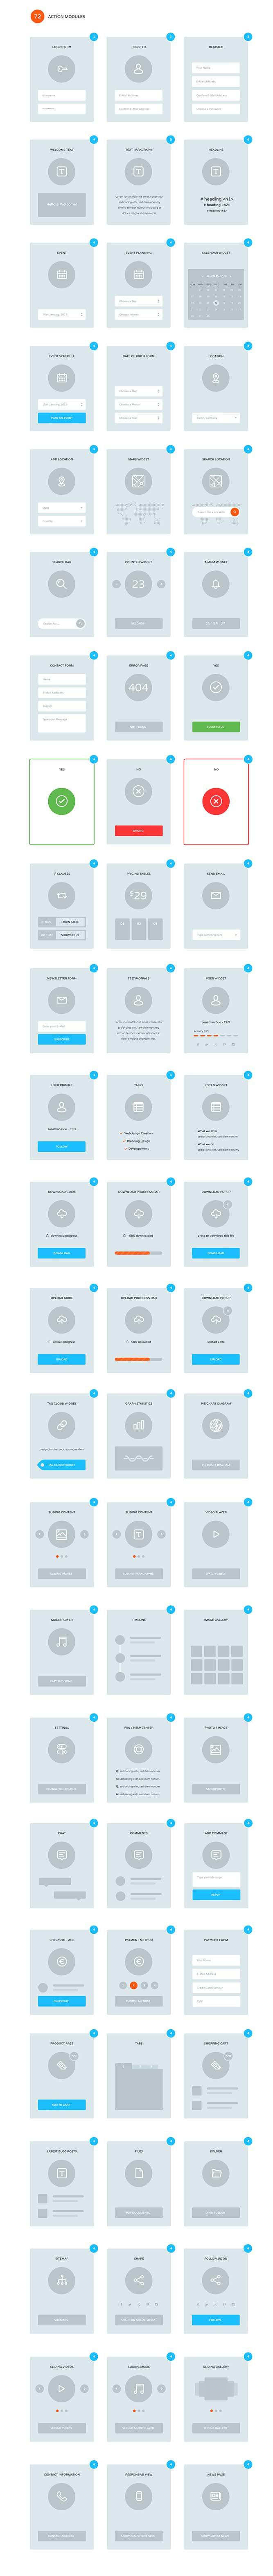 Flowchart UI UX Wireframe Kit